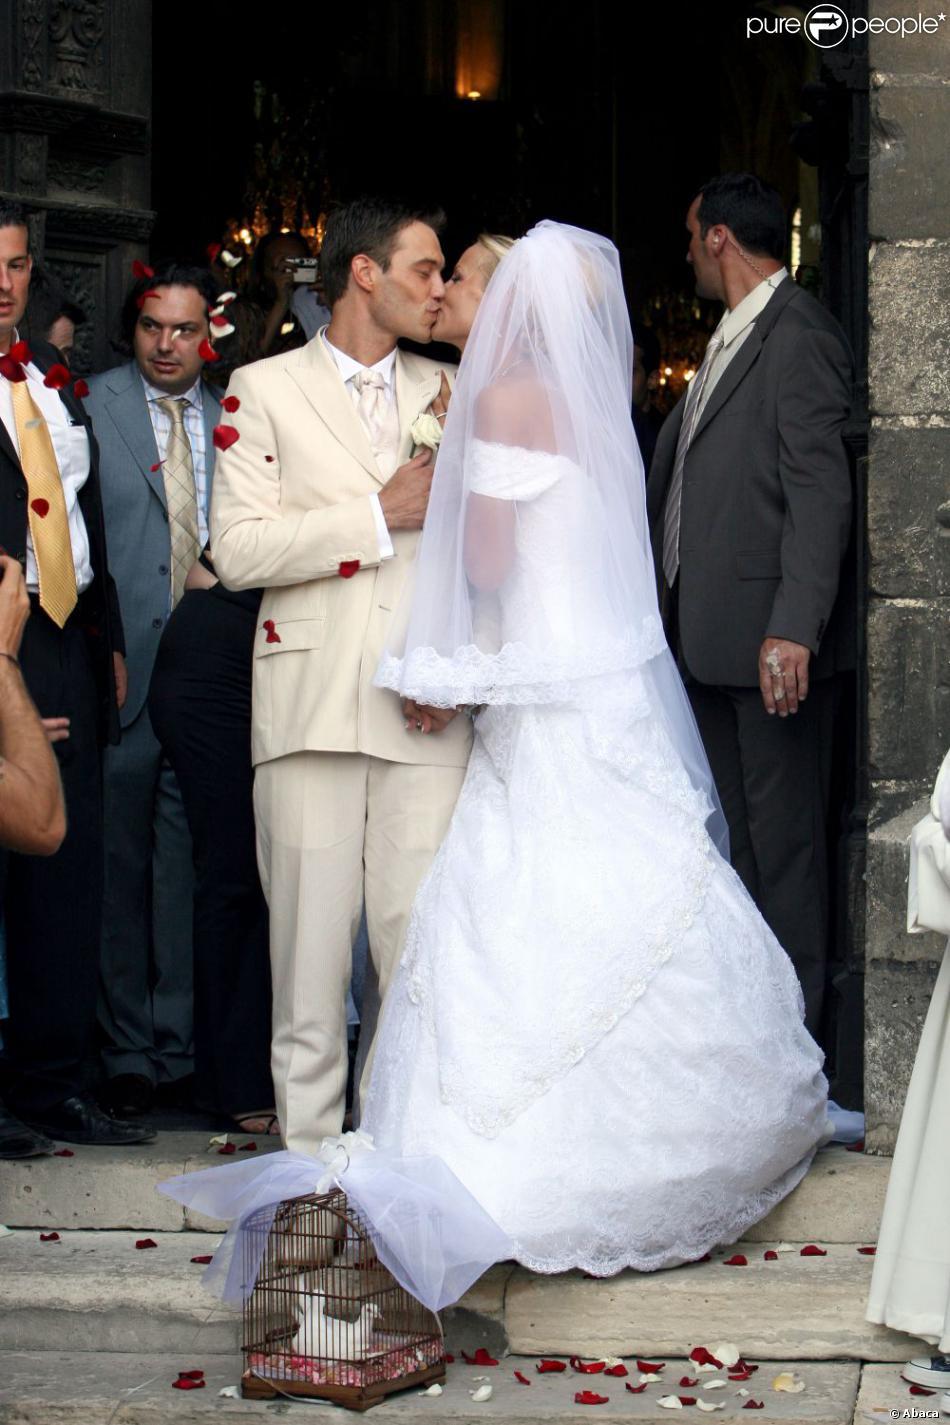 Elodie Gossuin et son mari Bertrand lors de leur mariage, en juillet 2006.